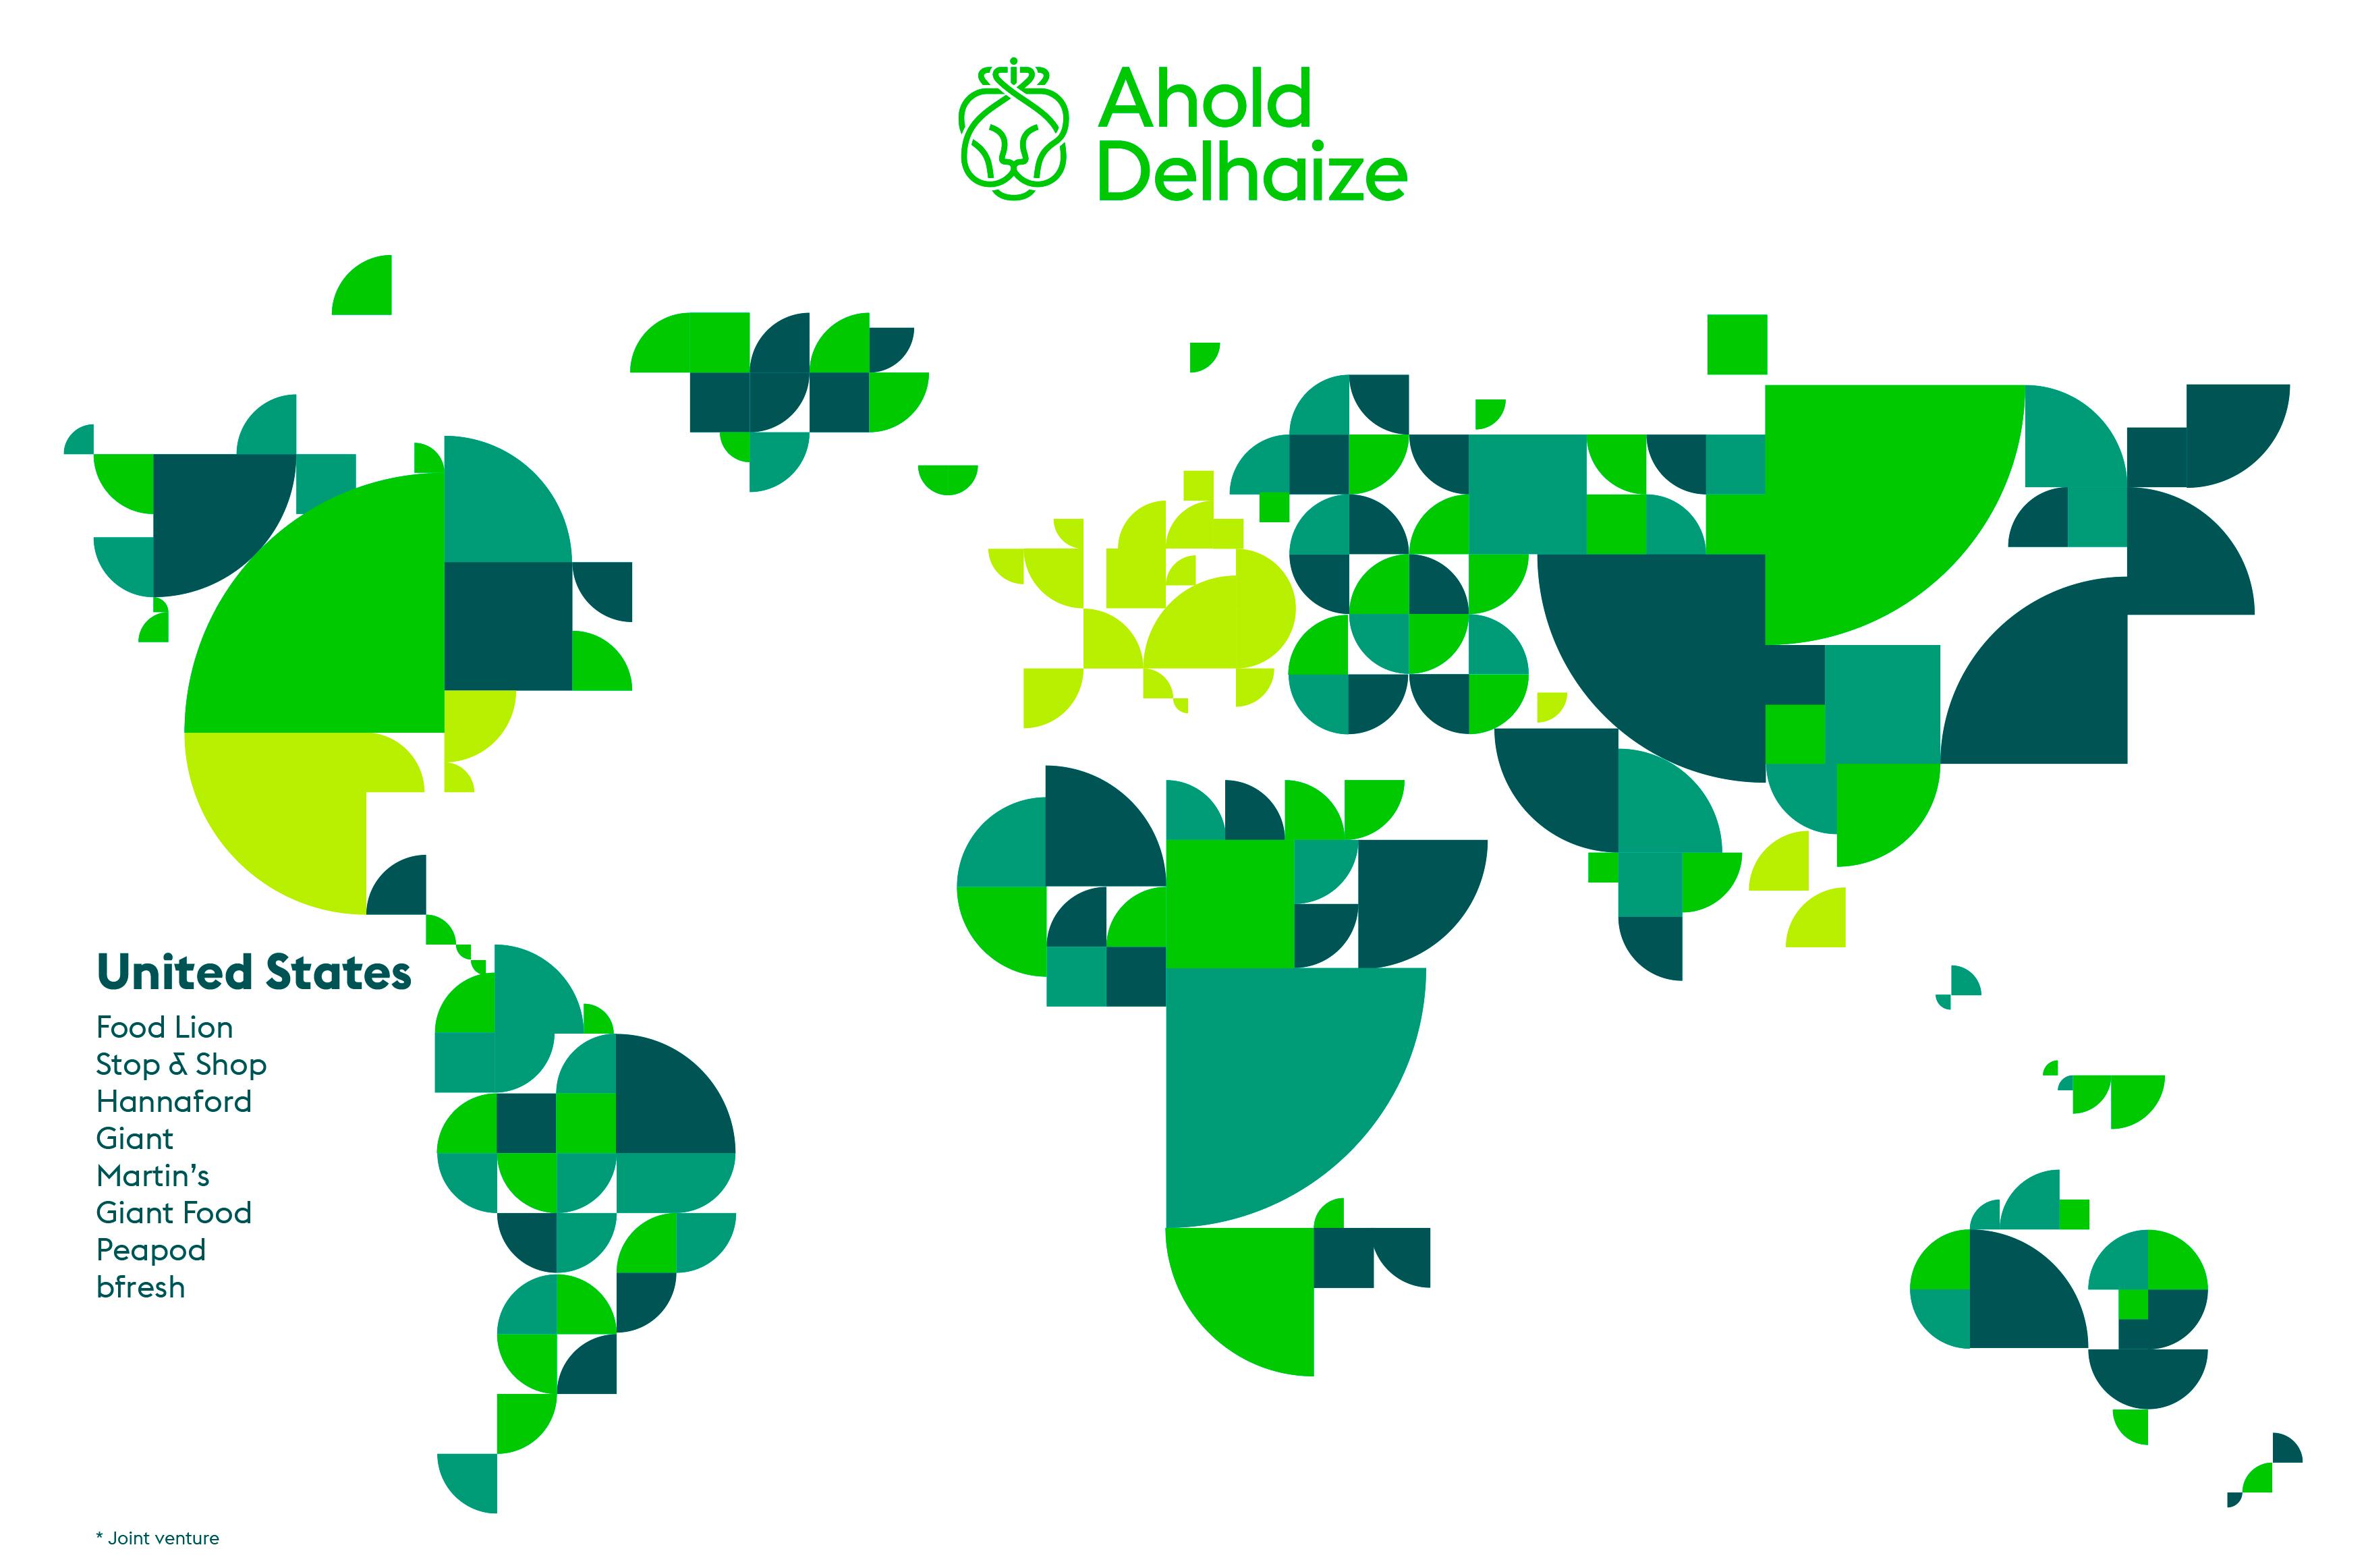 United States Ahold Delhaize - Map us foods pheonicx